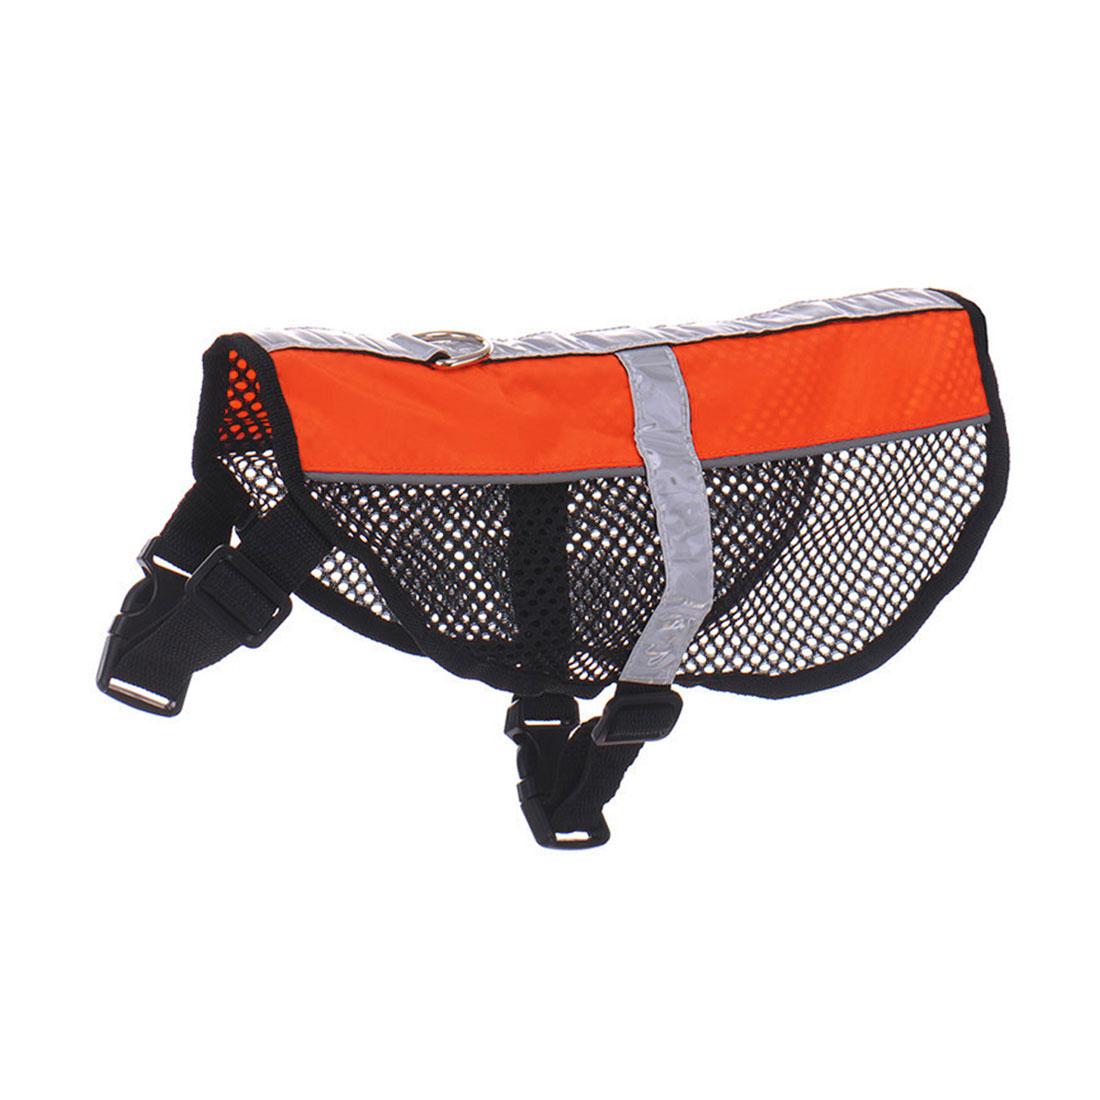 Service Dog Mesh Vest Harness Cool Comfort Nylon High Visibility Safety Jacket Orange M